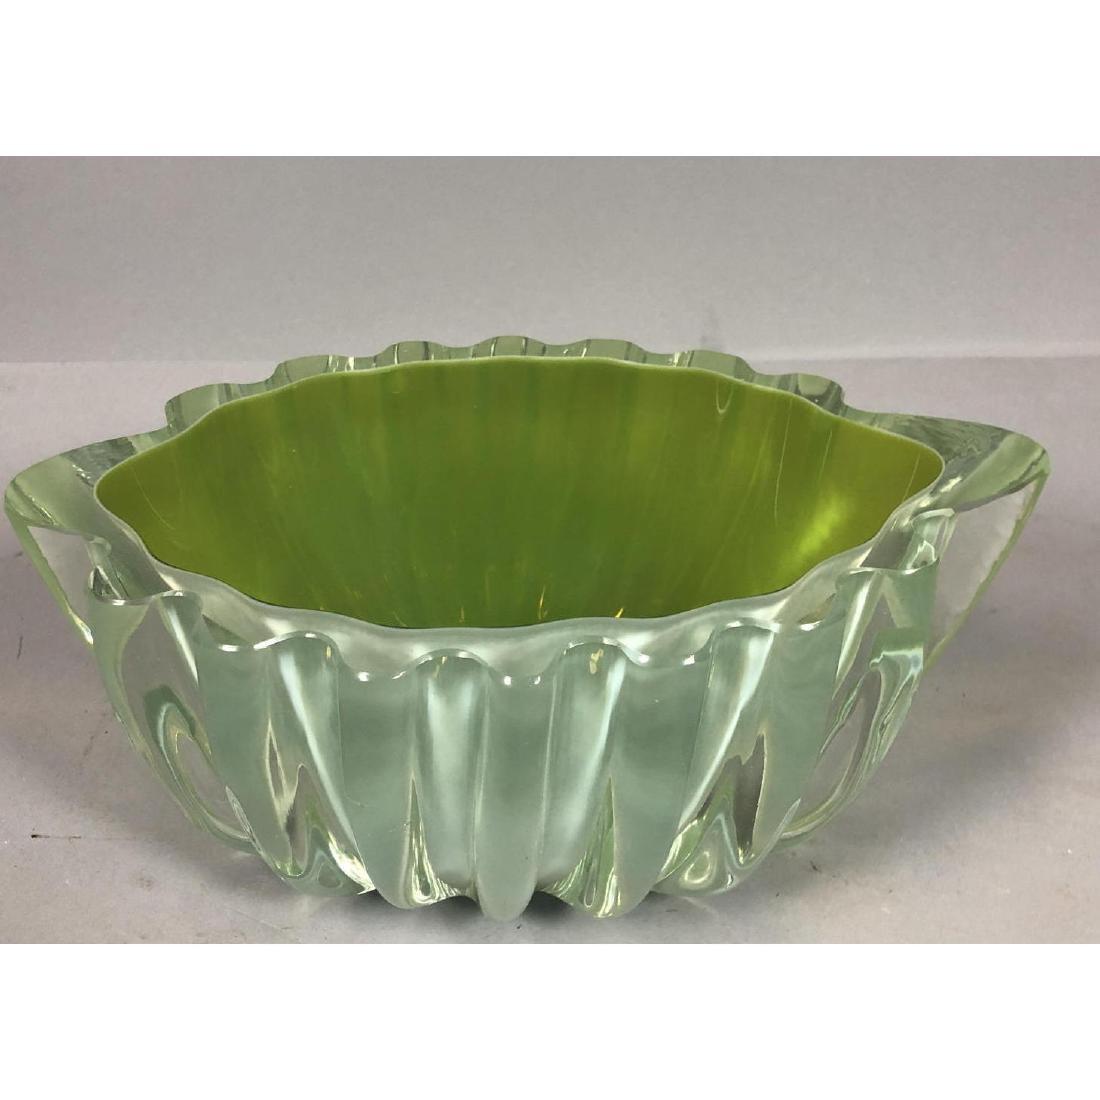 Barovier Toso style Heavy Murano Art Glass Bowl.